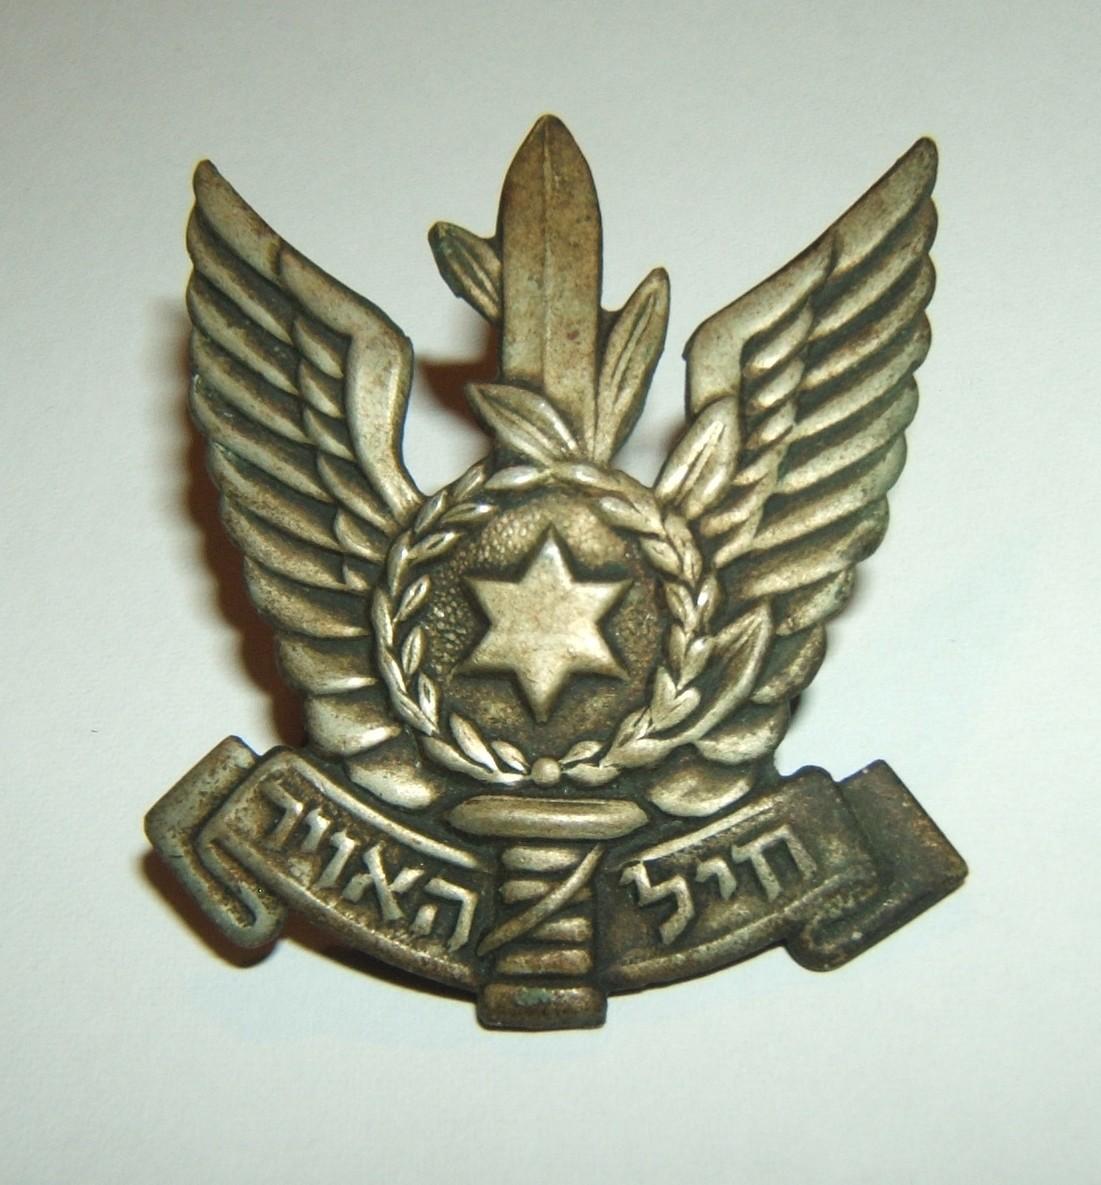 IAF emblem hat badge with screw-back reverse, c. 1960s